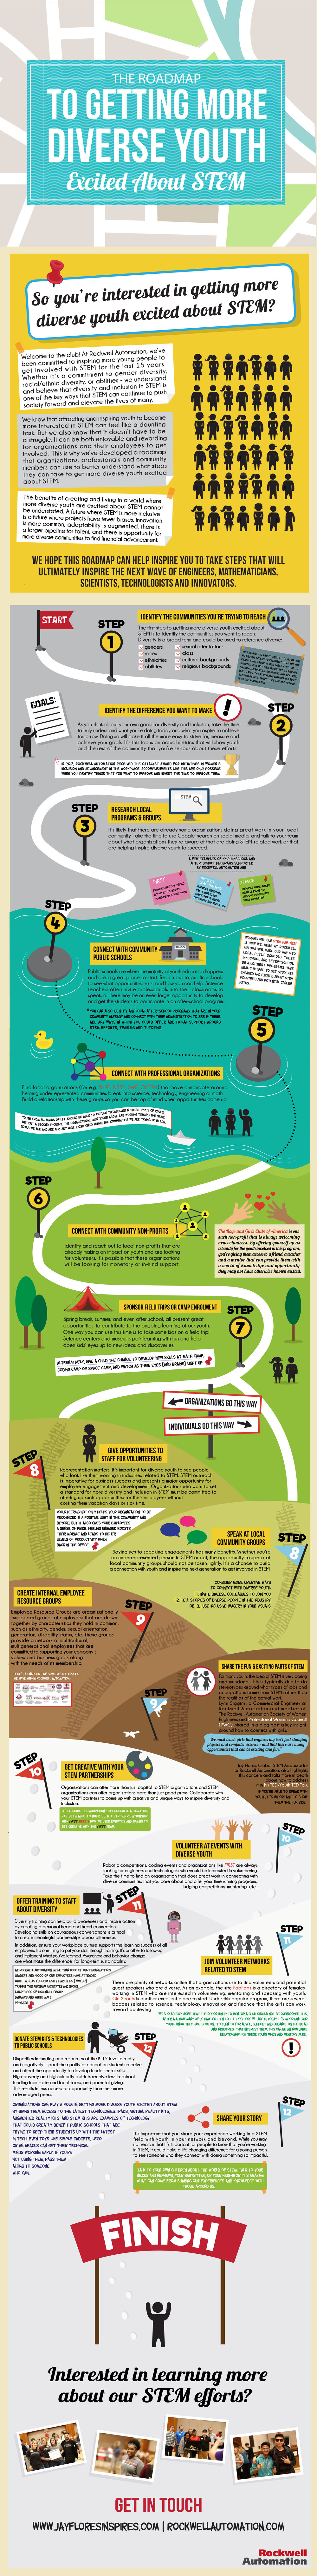 Rockwell Diversity Roadmap - Jay Flores.jpg